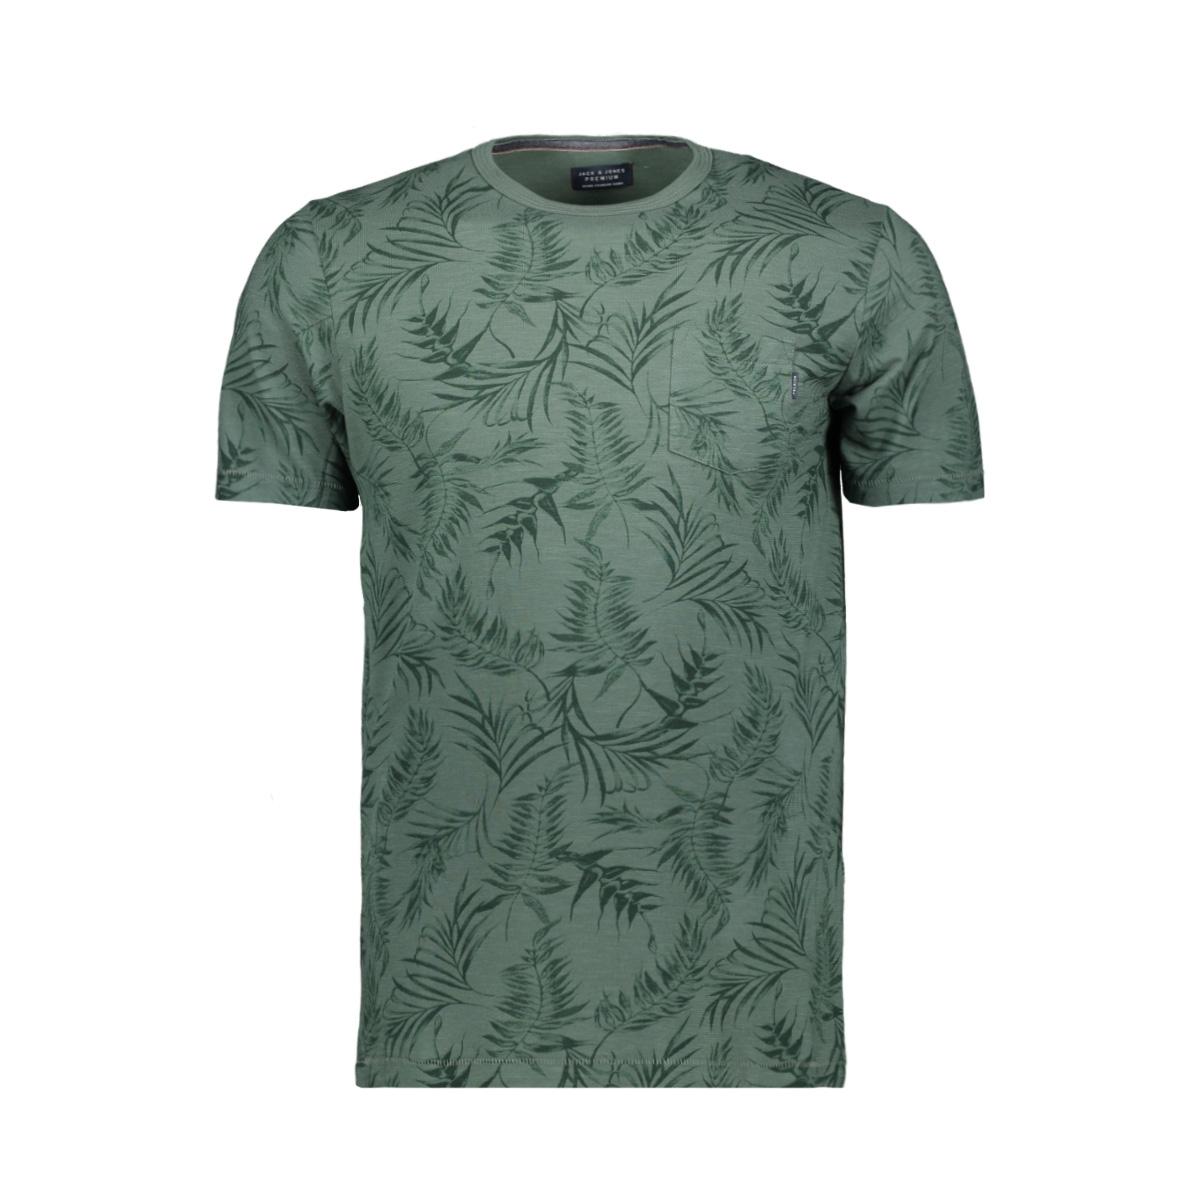 jprsean. blu. tee ss crew neck 12149369 jack & jones t-shirt duck green/ slim fit